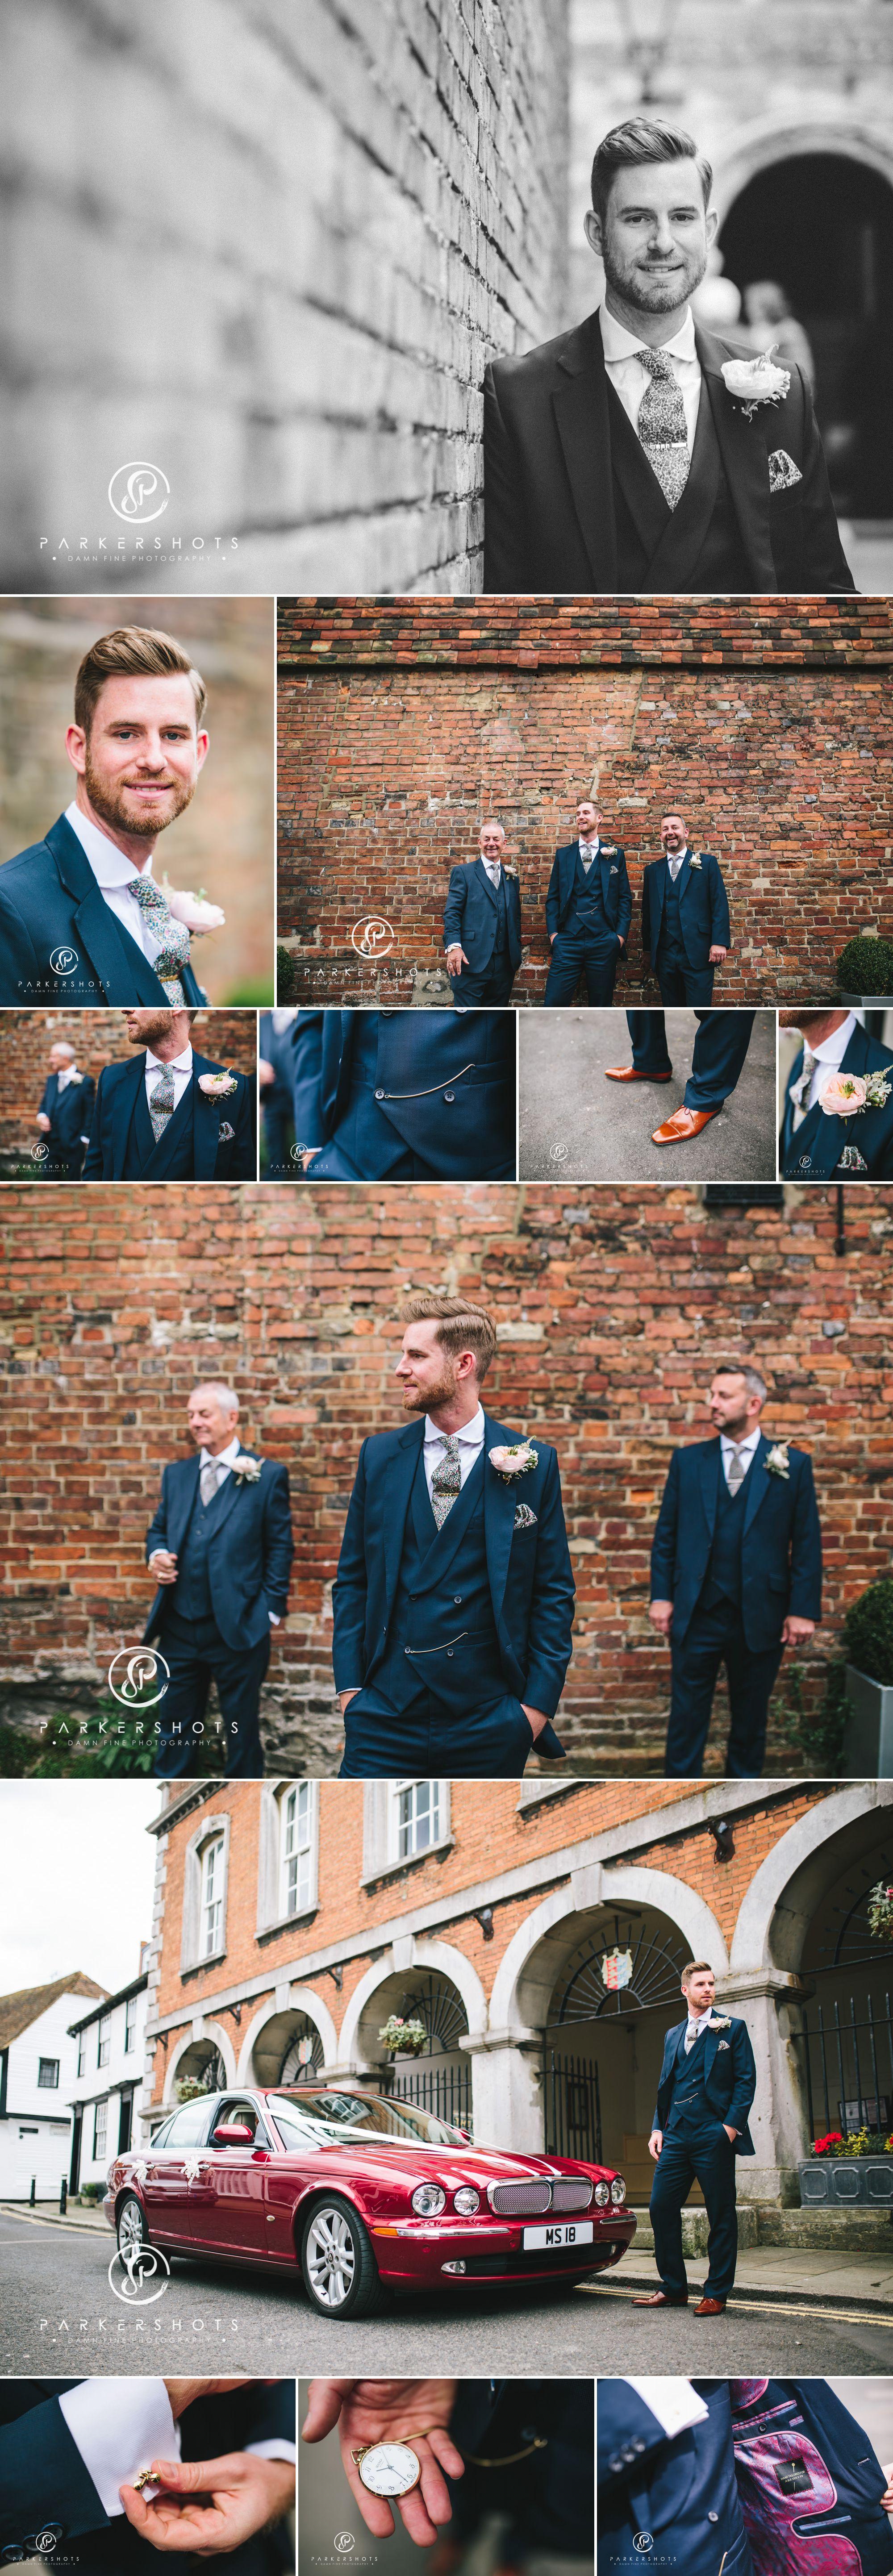 The_George_In_Rye_Wedding_Photographer 2